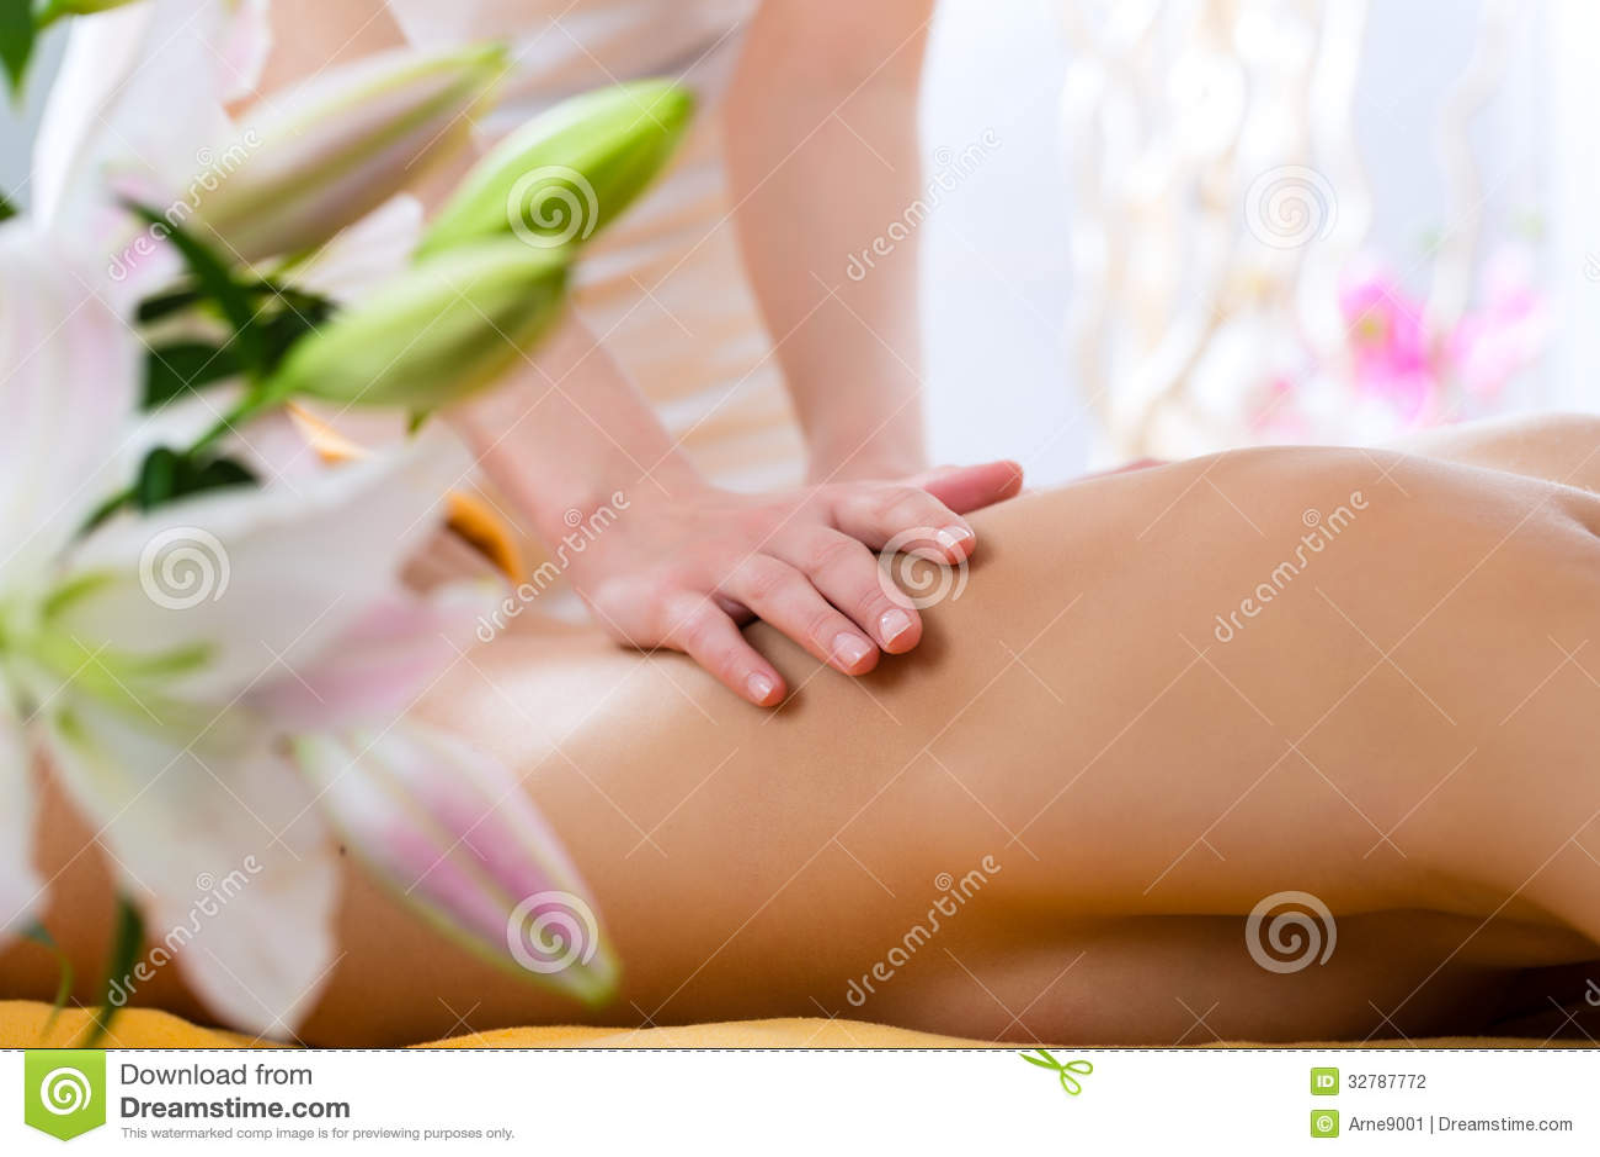 Wellness - woman getting body massage in Spa